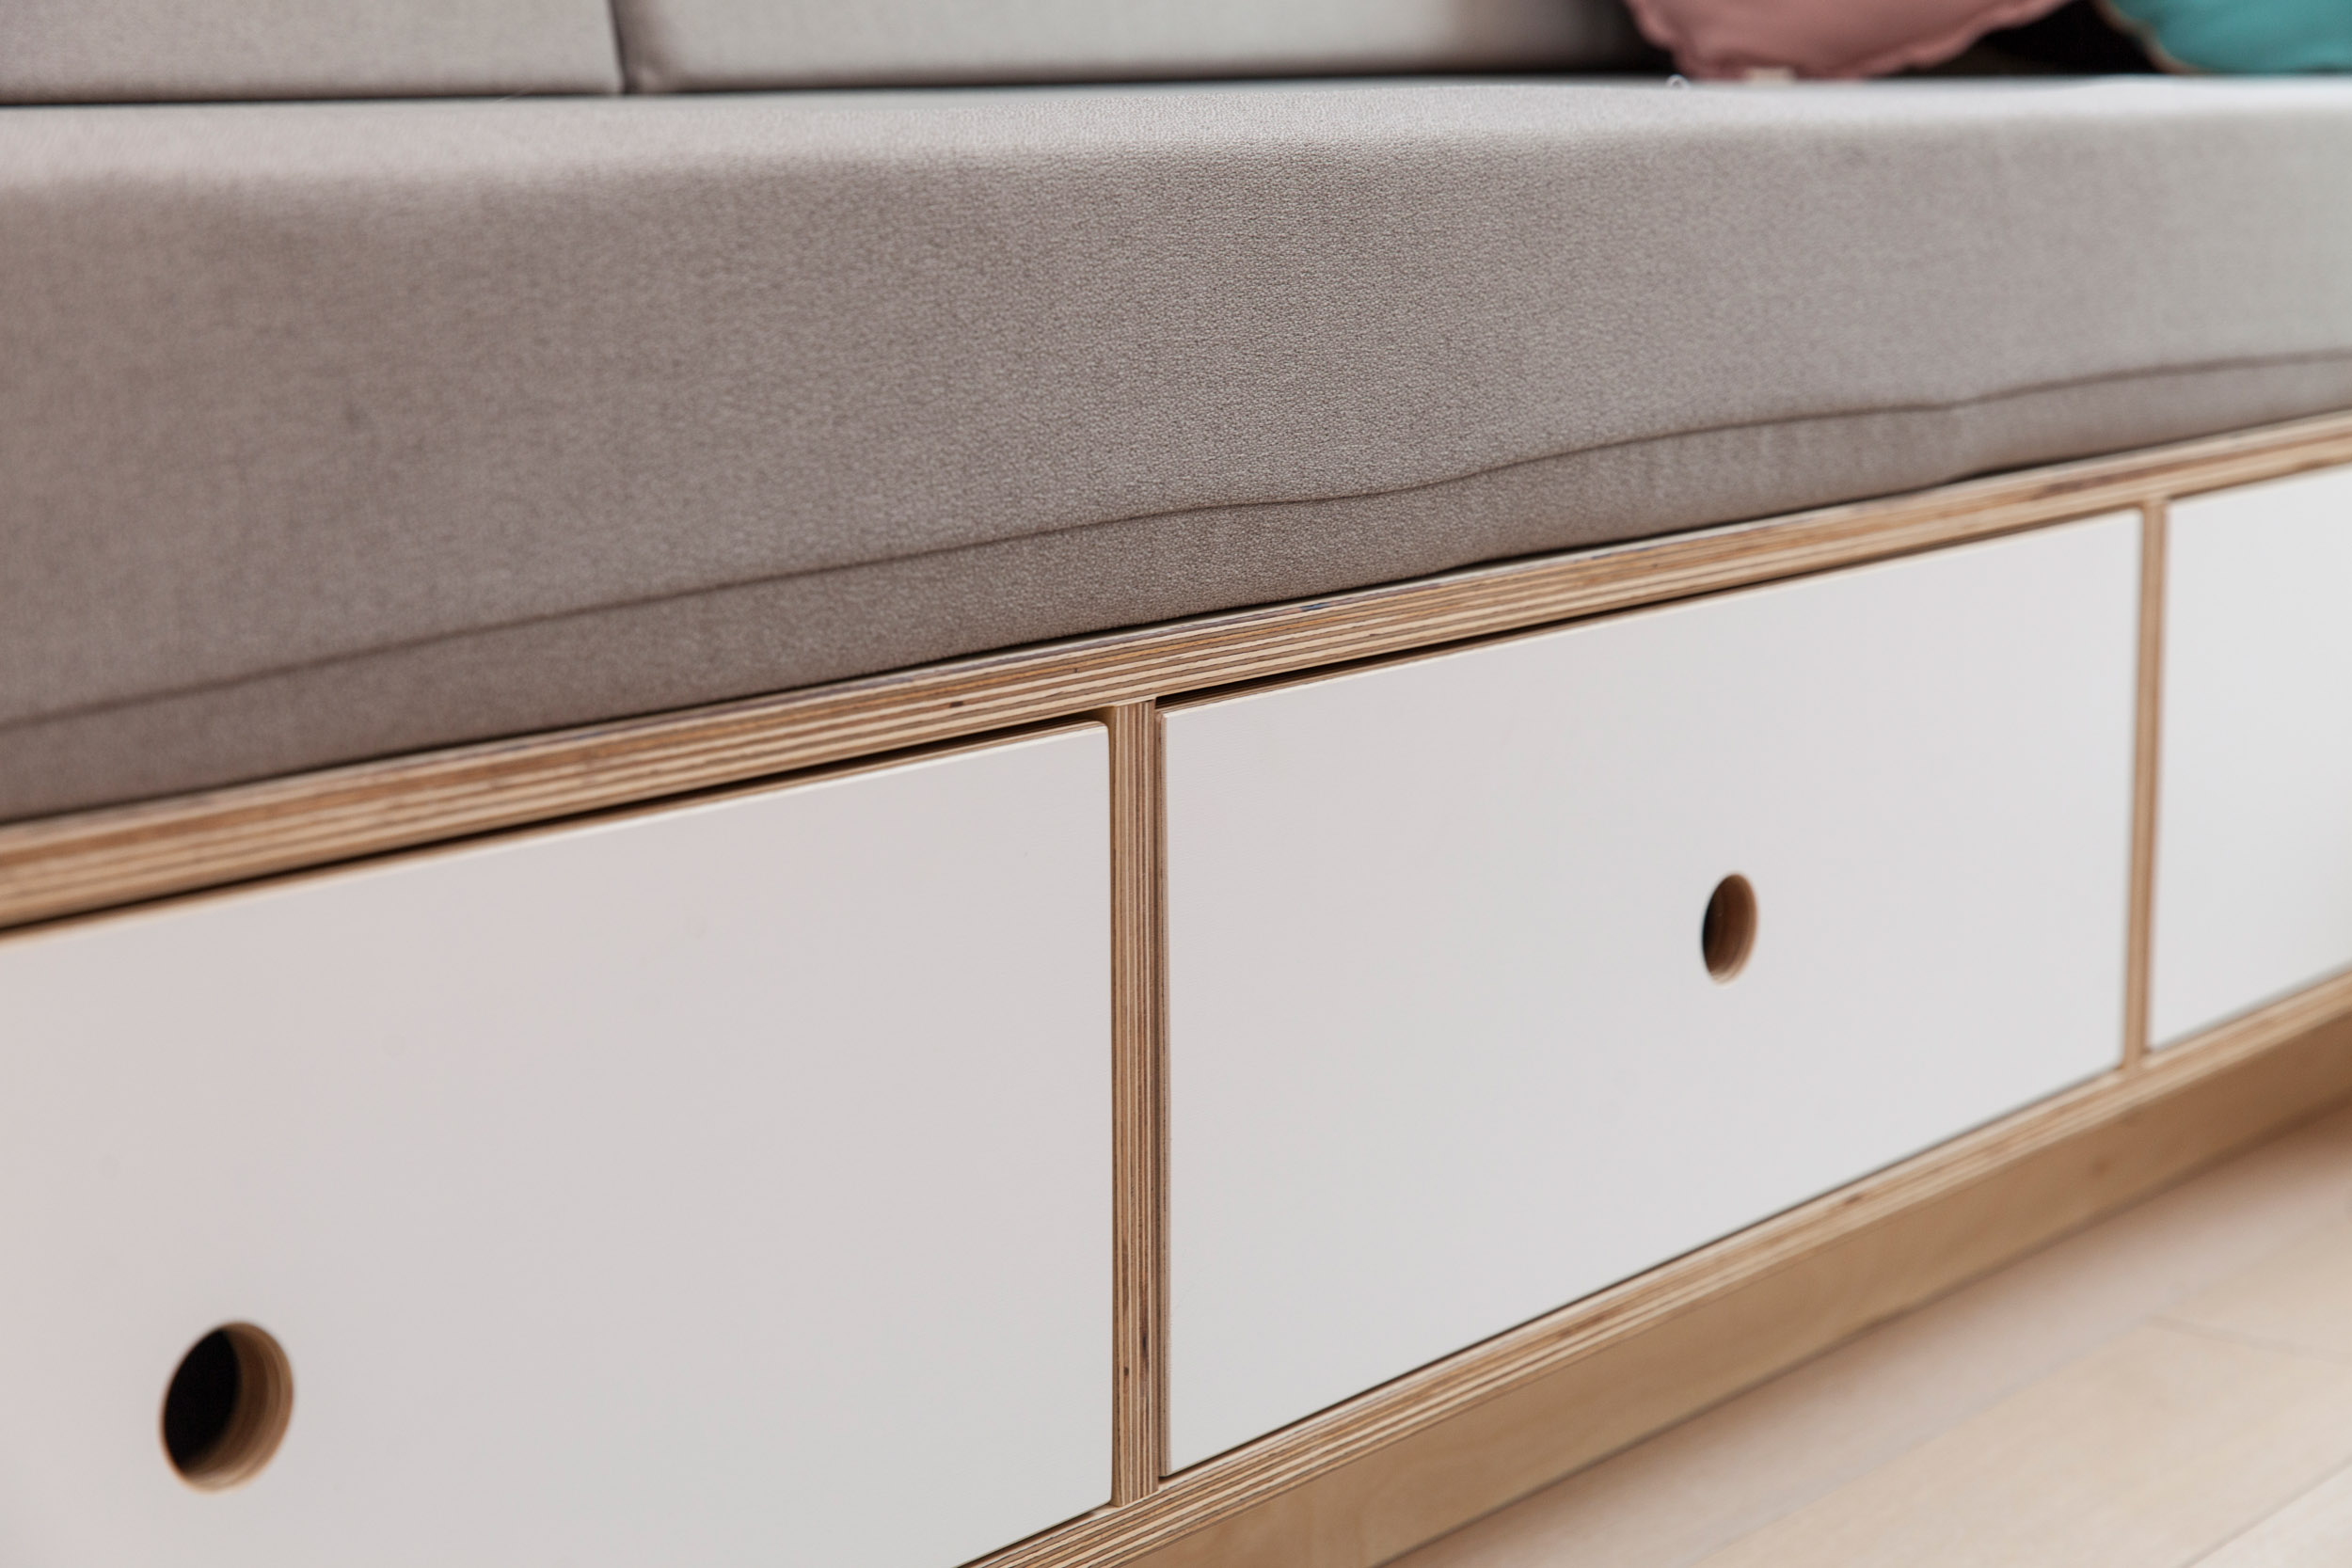 casa kids bench storage drawers